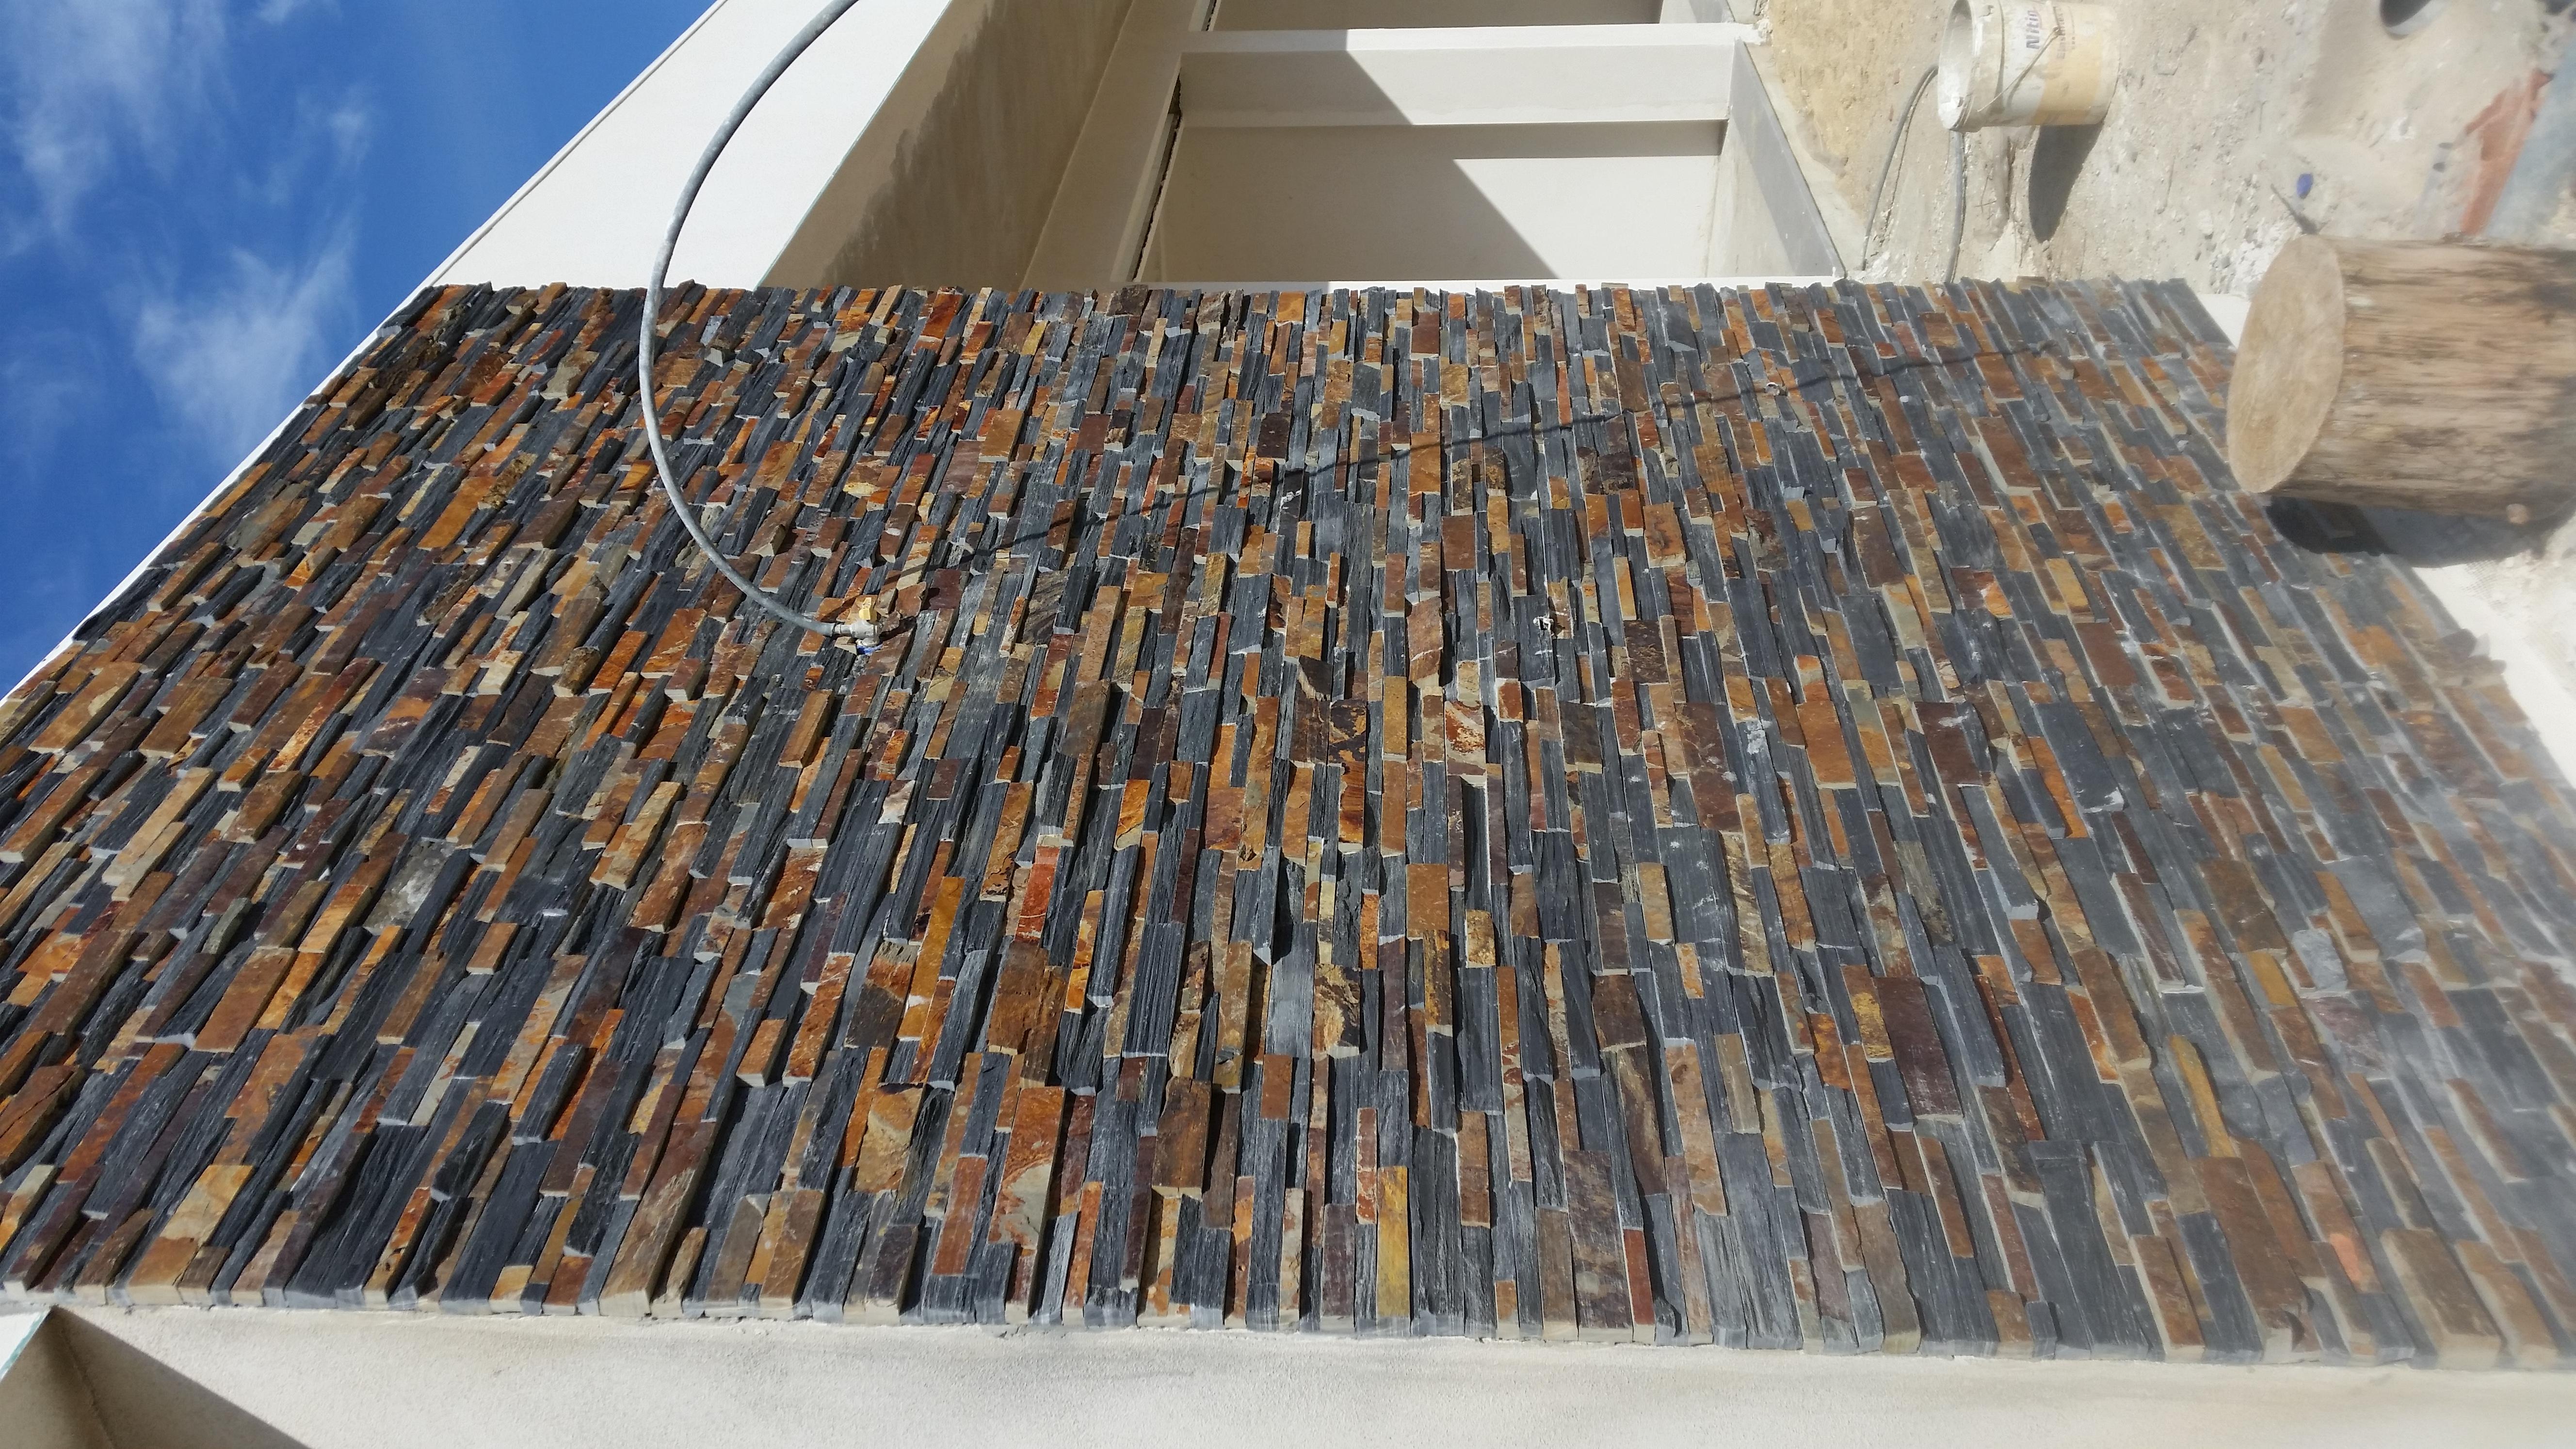 Parede-em-Xisto-Multicolor-e-ardósia-preta-Painel-mix-55x15x2-3-Ref.-54-6